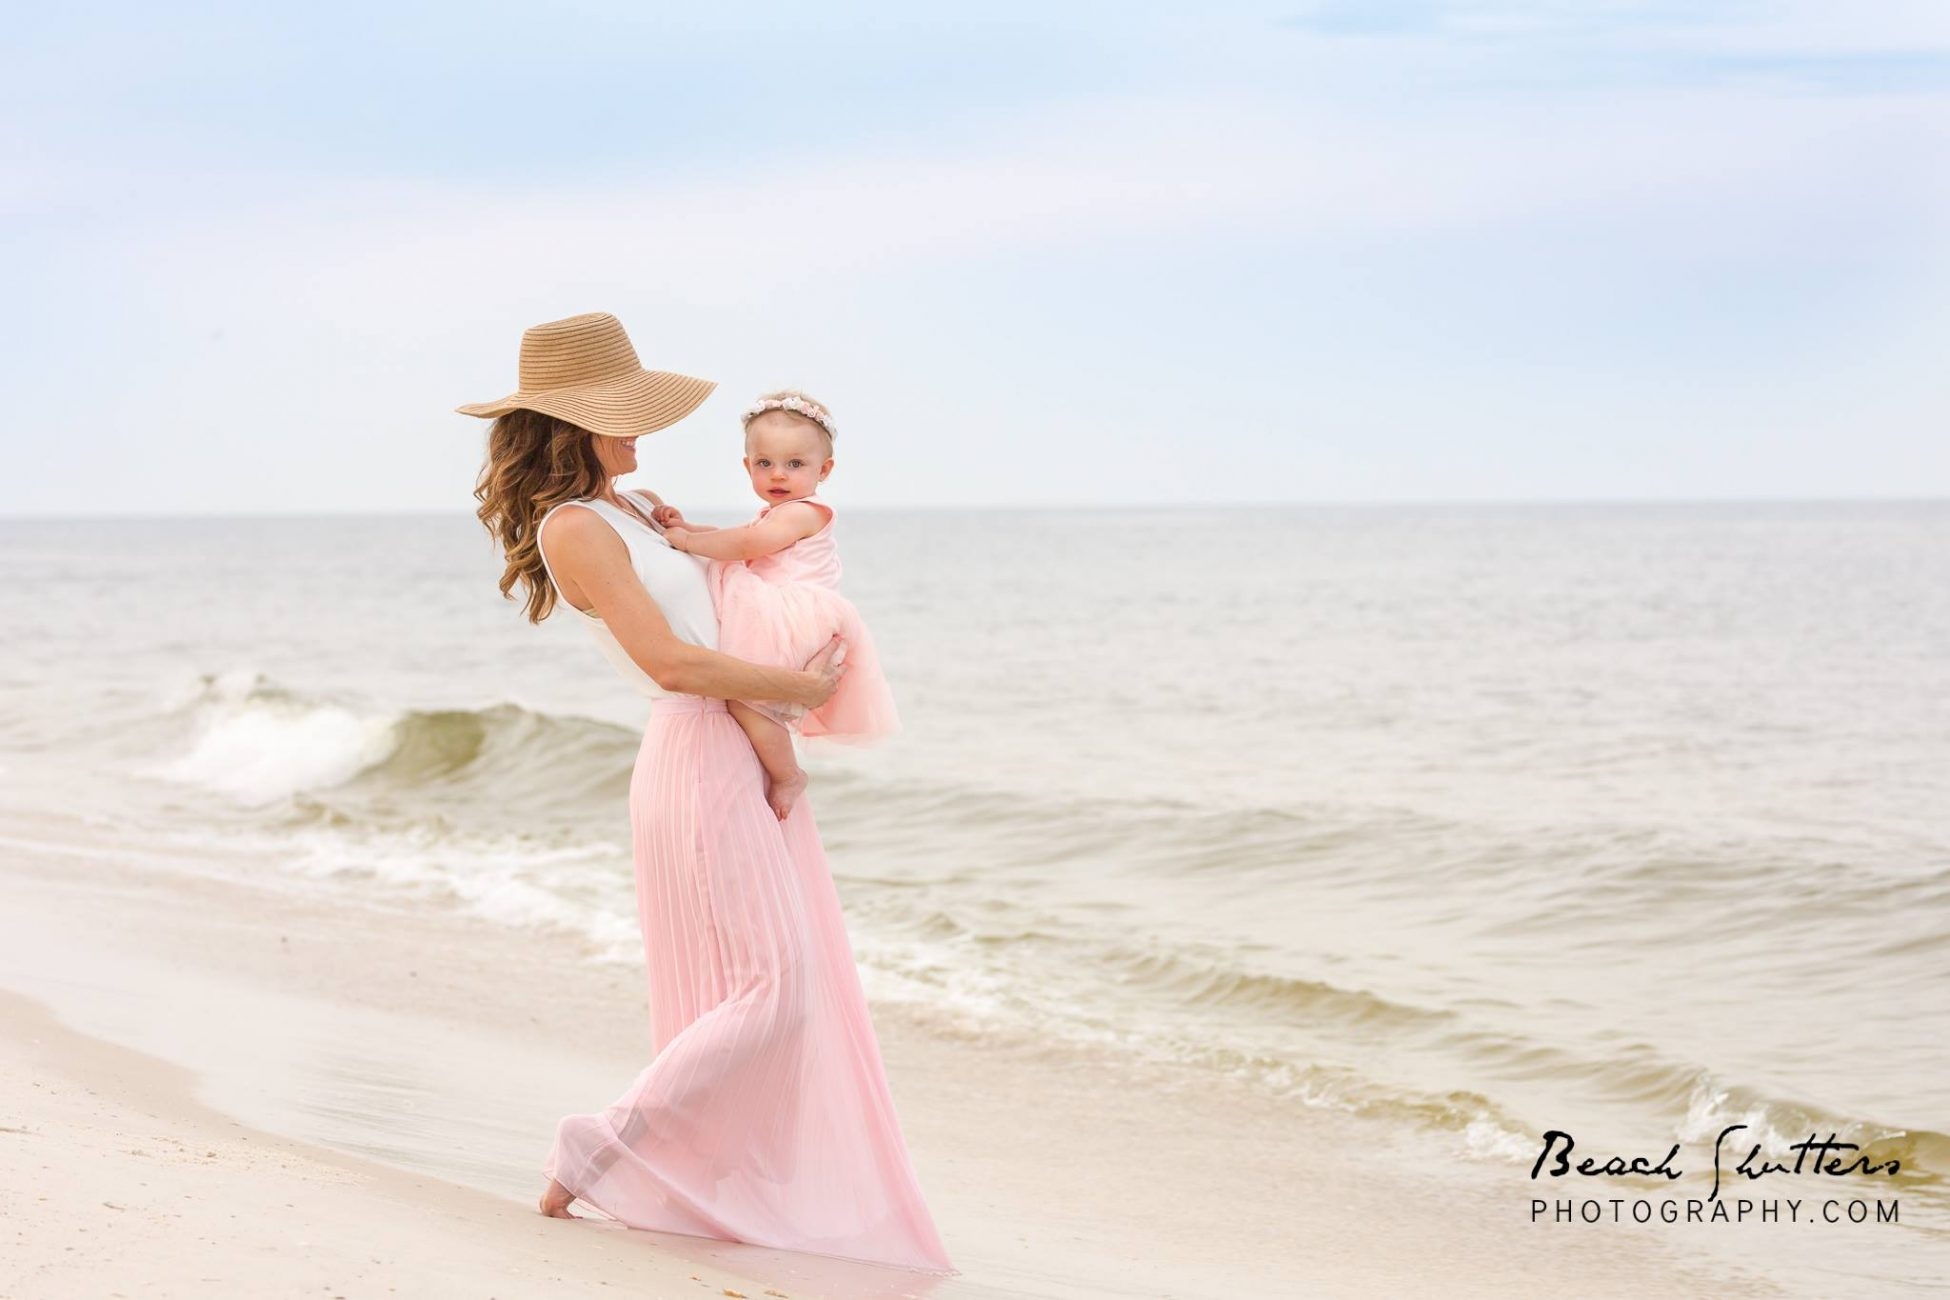 Capturing magical photos in Orange beach taken by a photographer